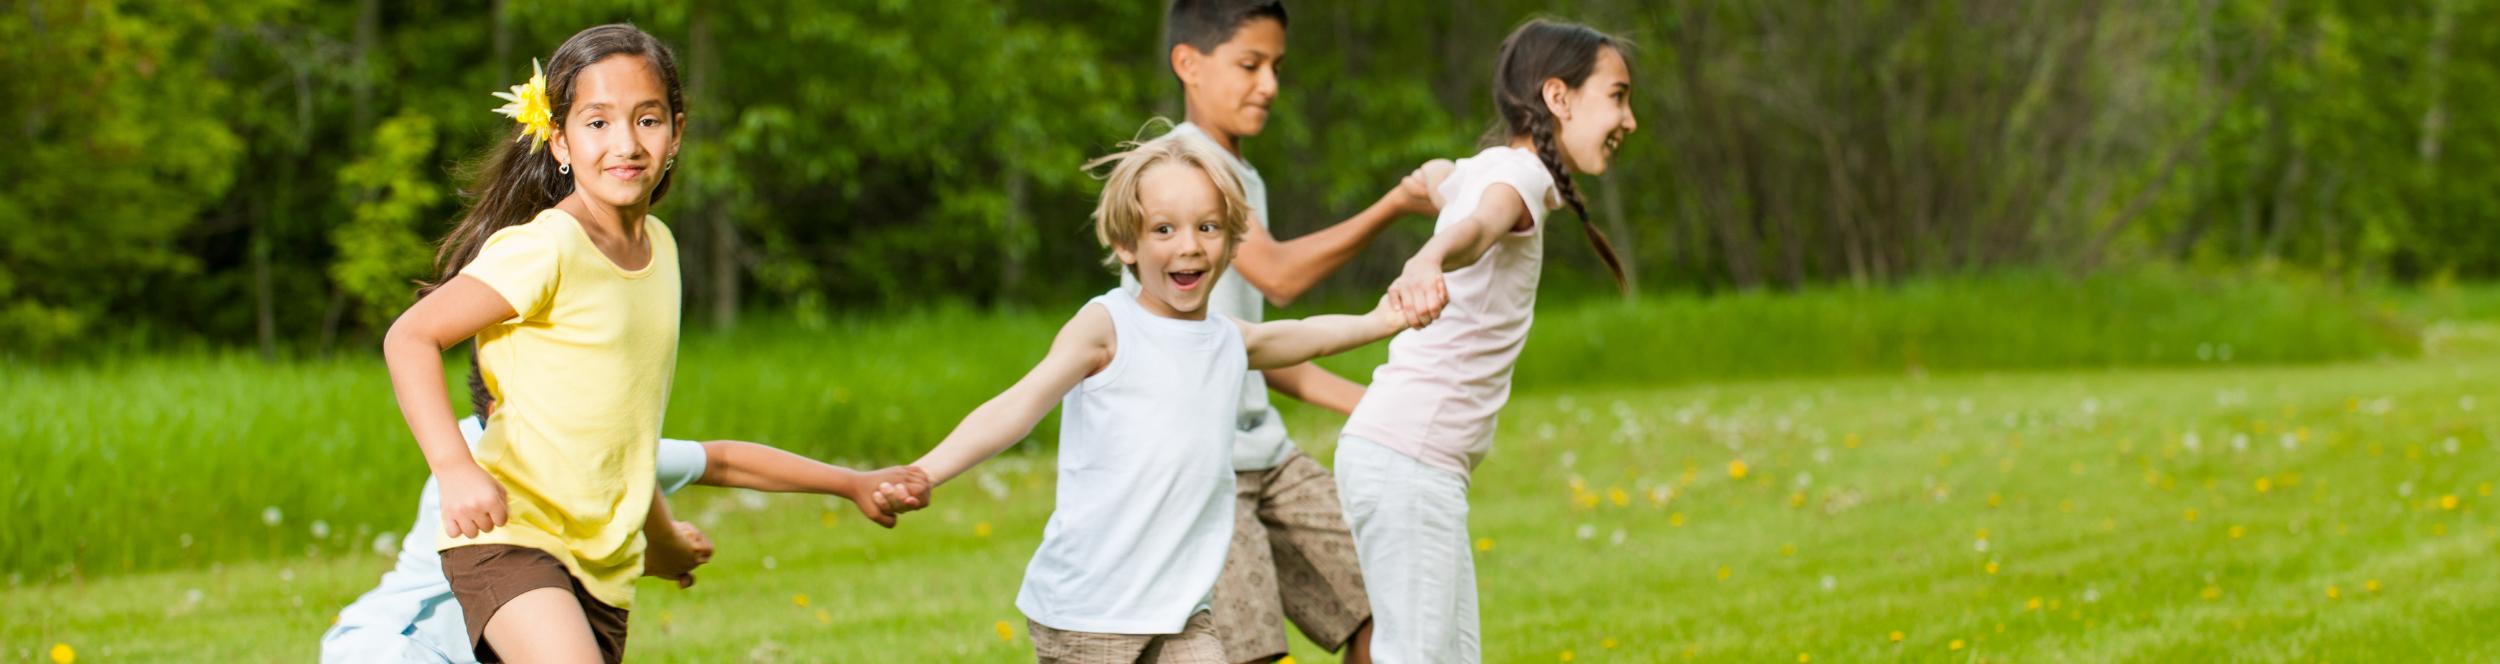 children running holding hands